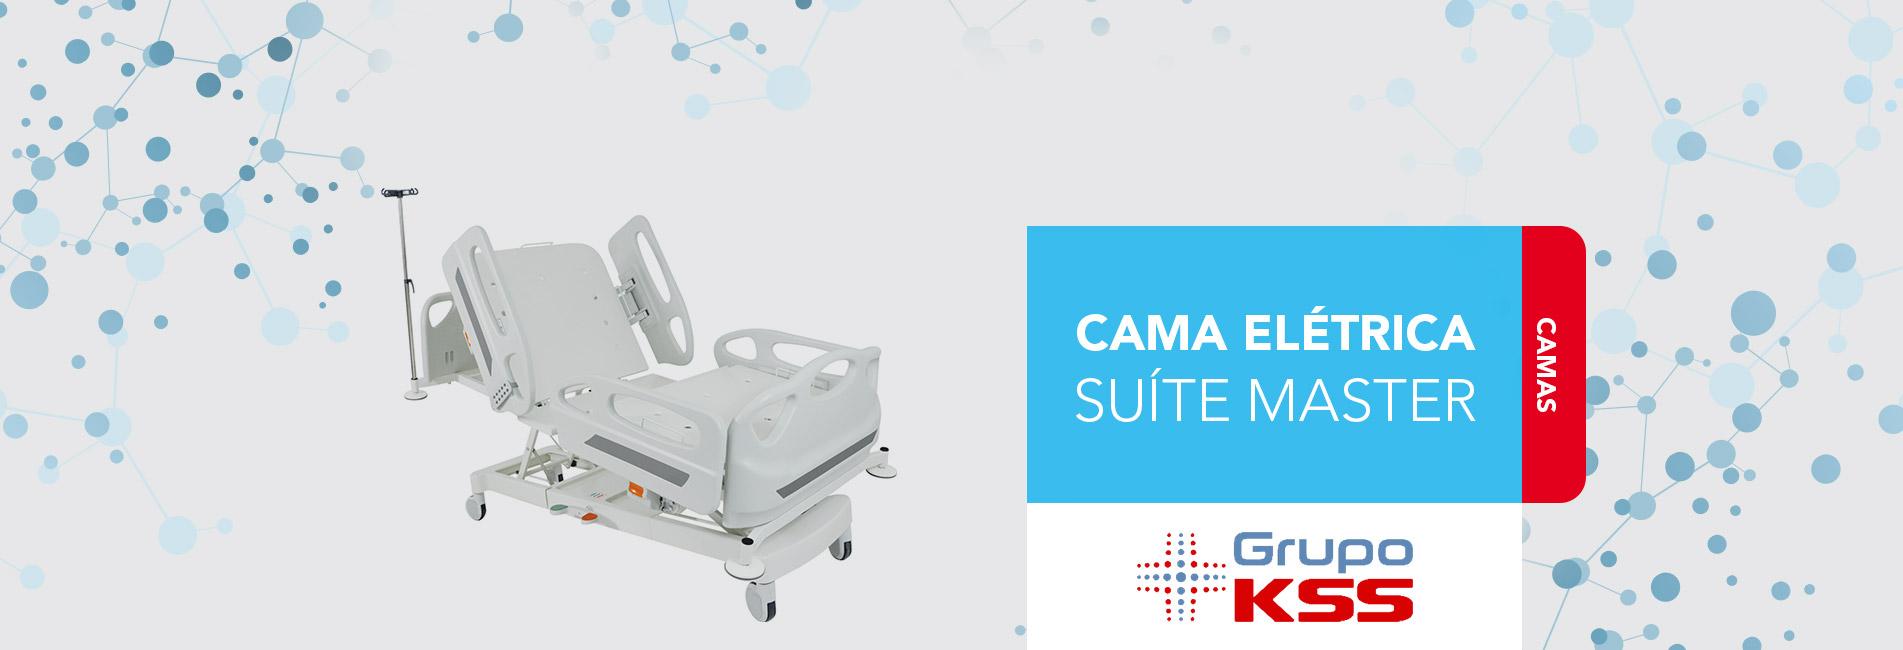 slider_cama-suite-master